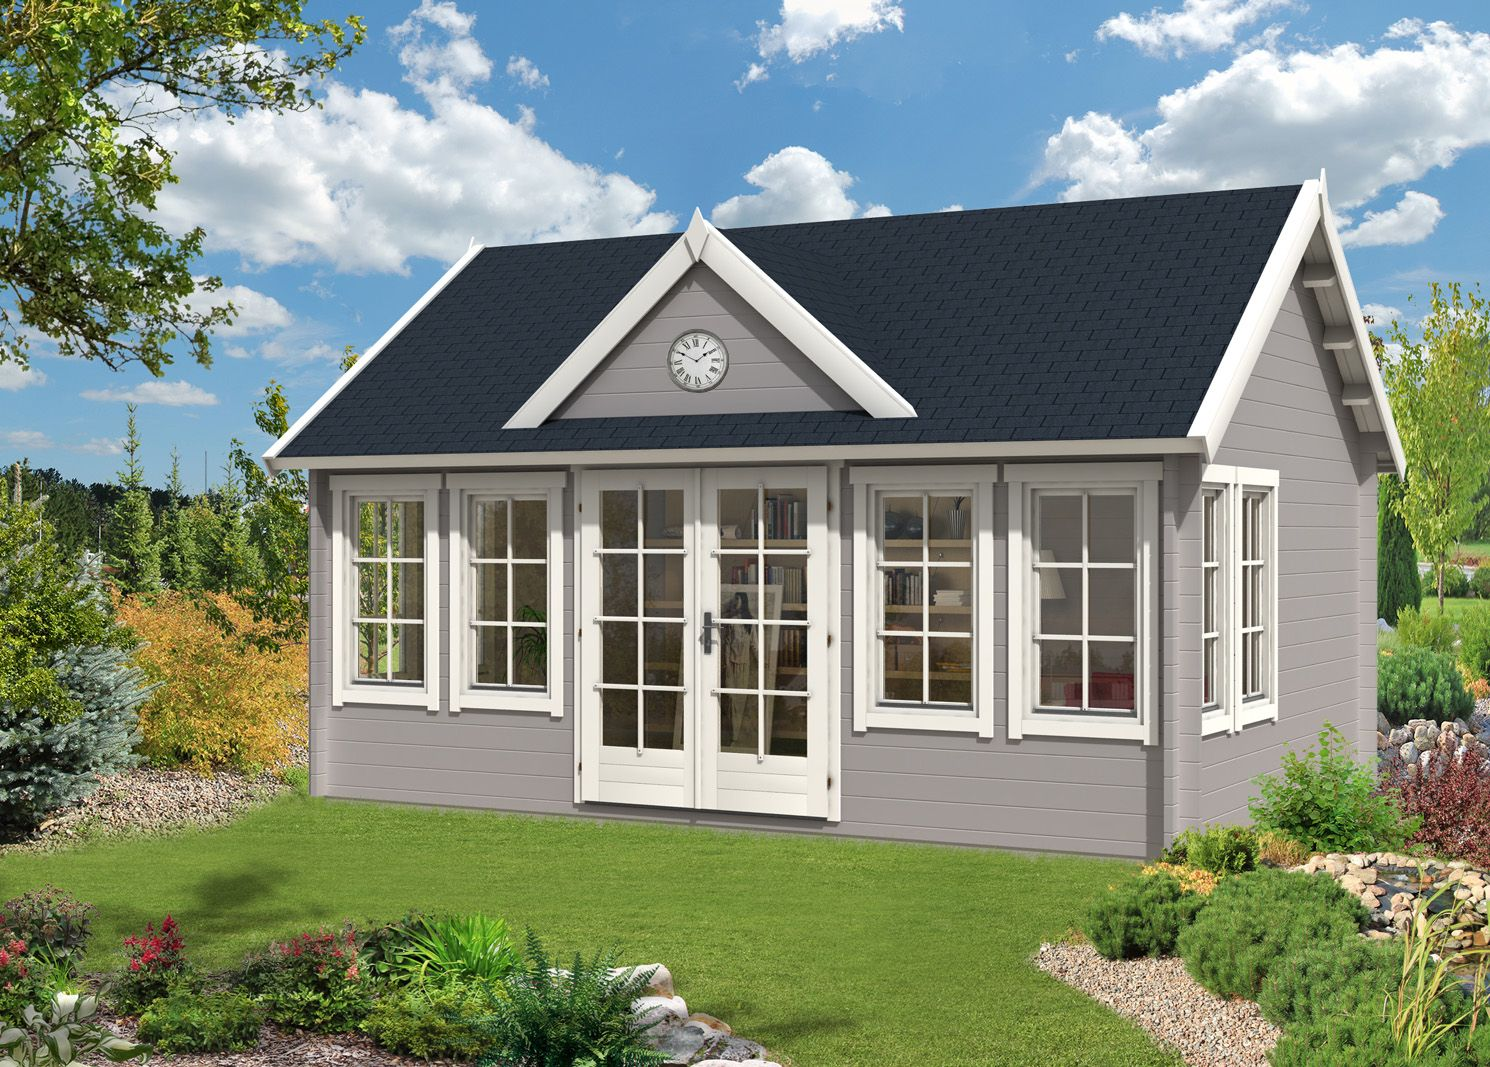 Gartenhaus Modell ClockhouseXL Gartenhaus, Haus, Style